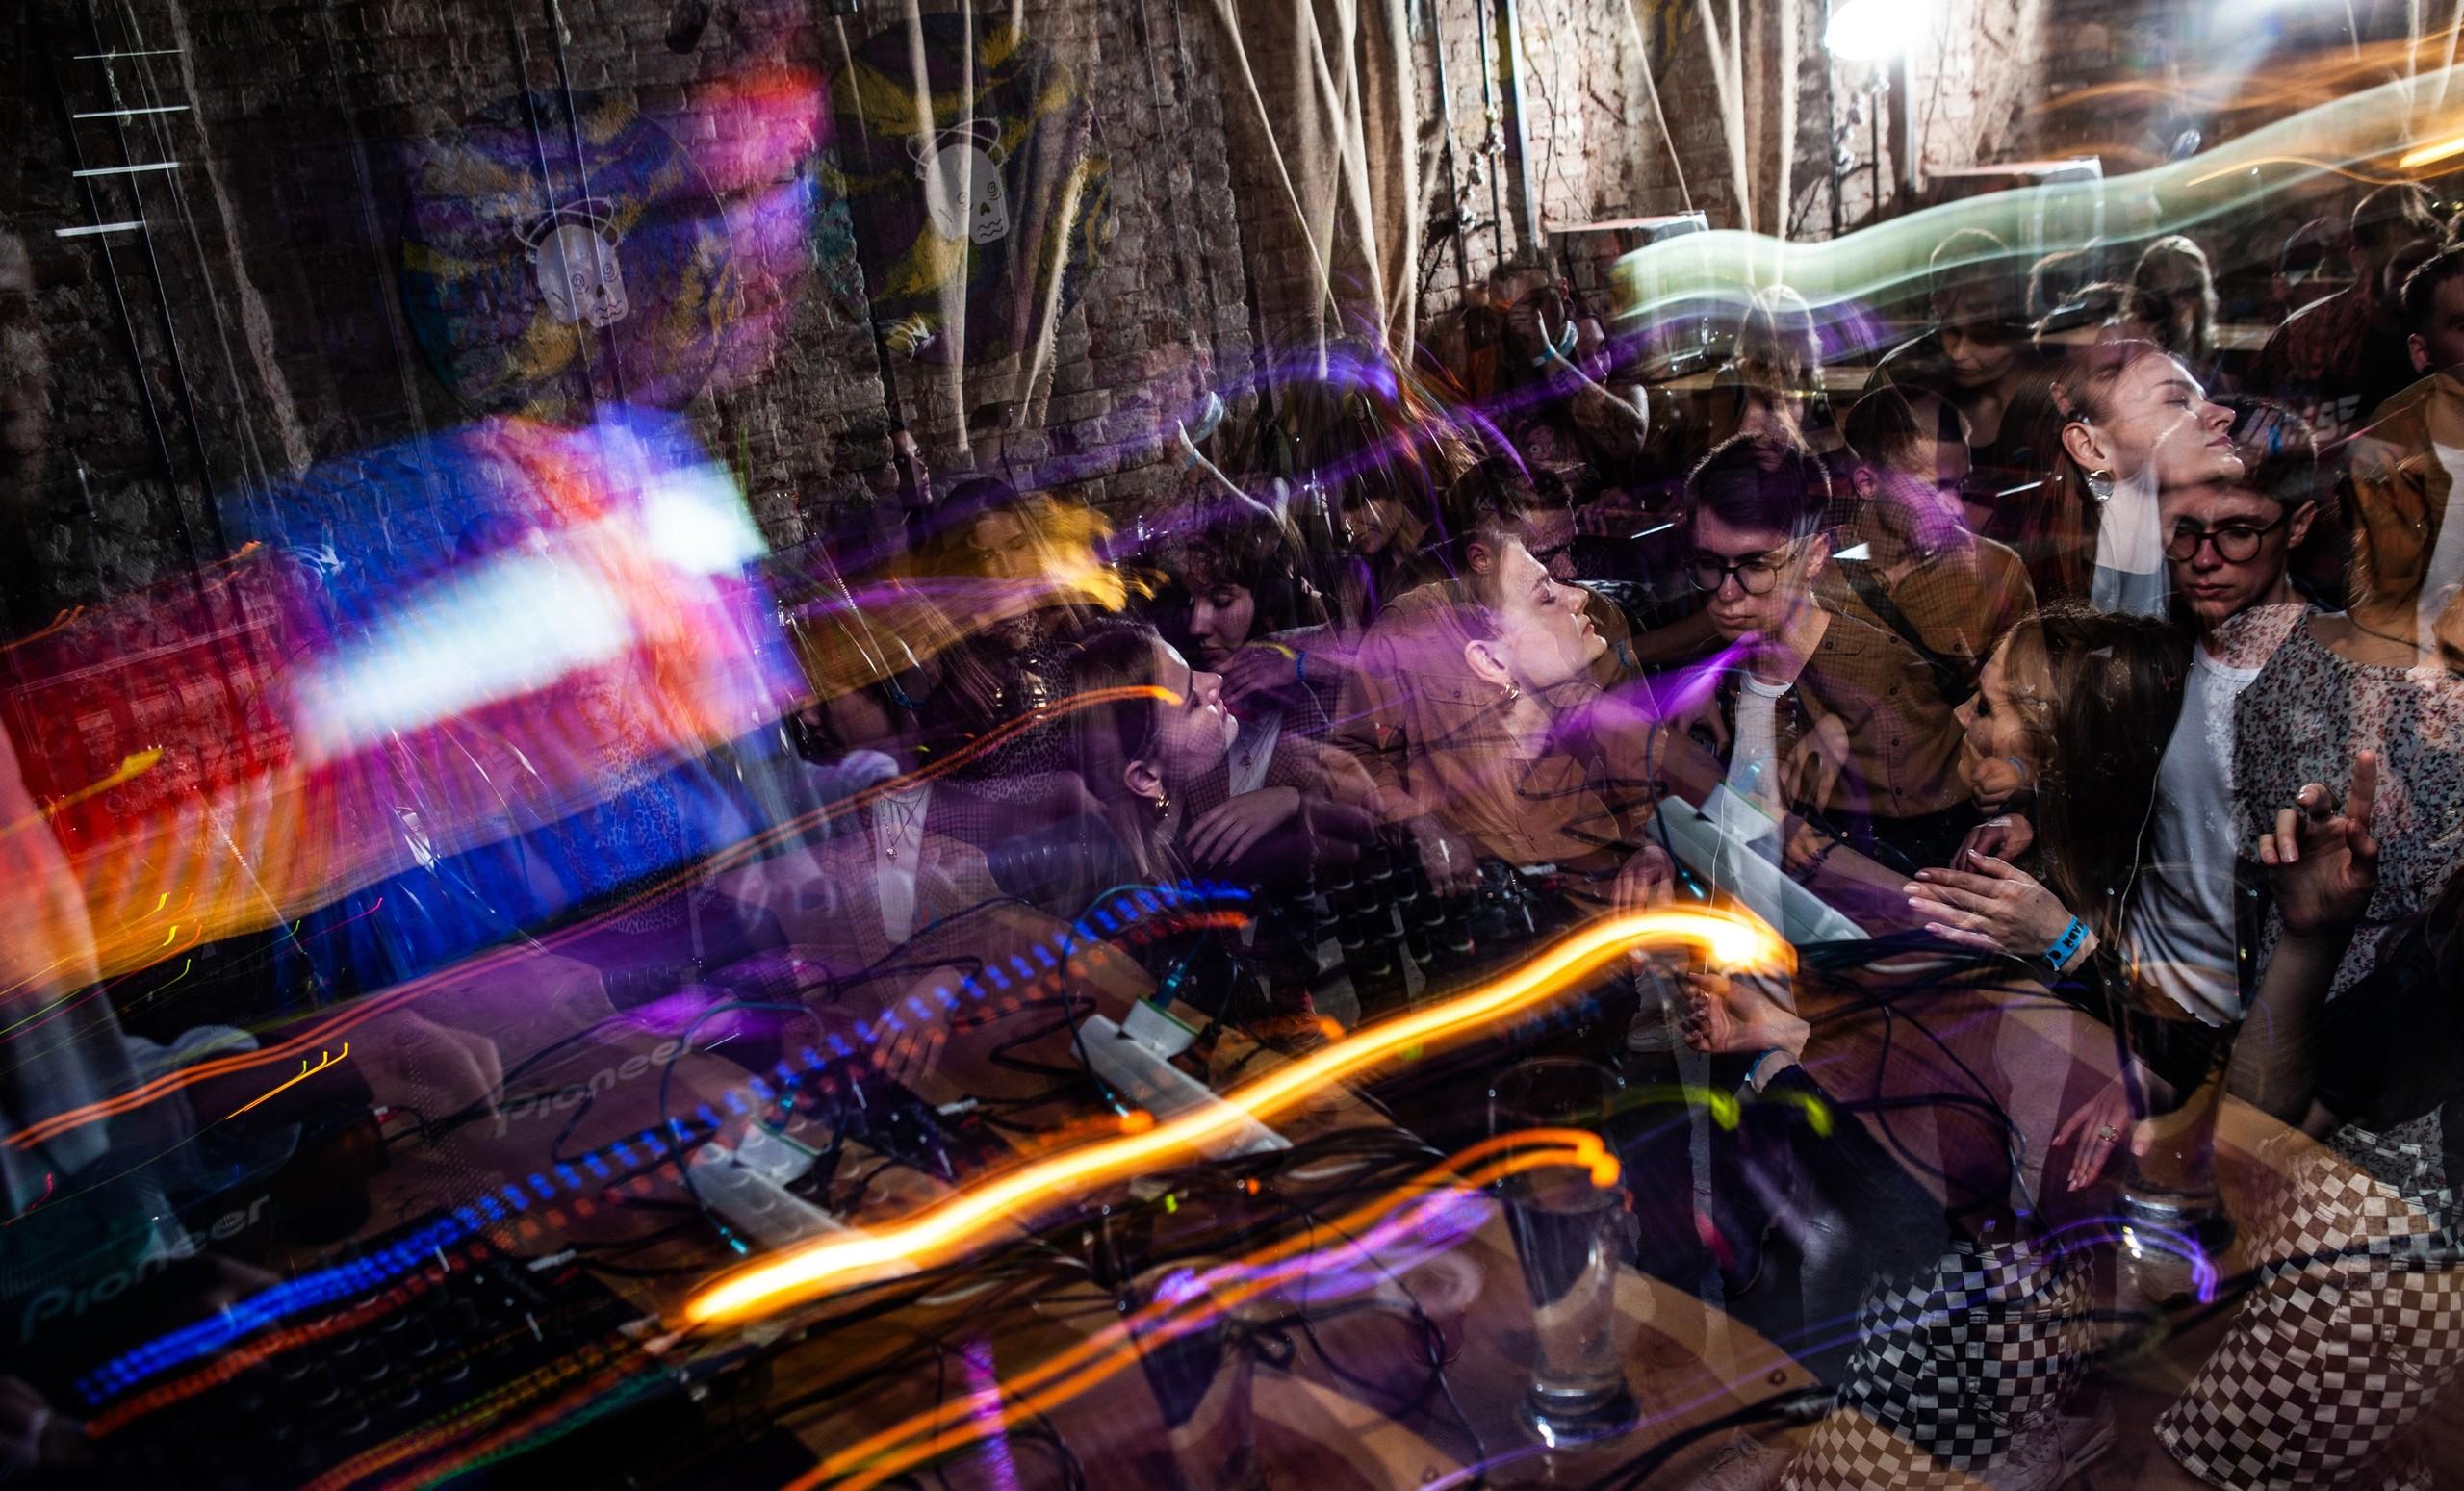 Сергей Булдаков в баре «Вечно молодой». Фото: @wechno.molodoi